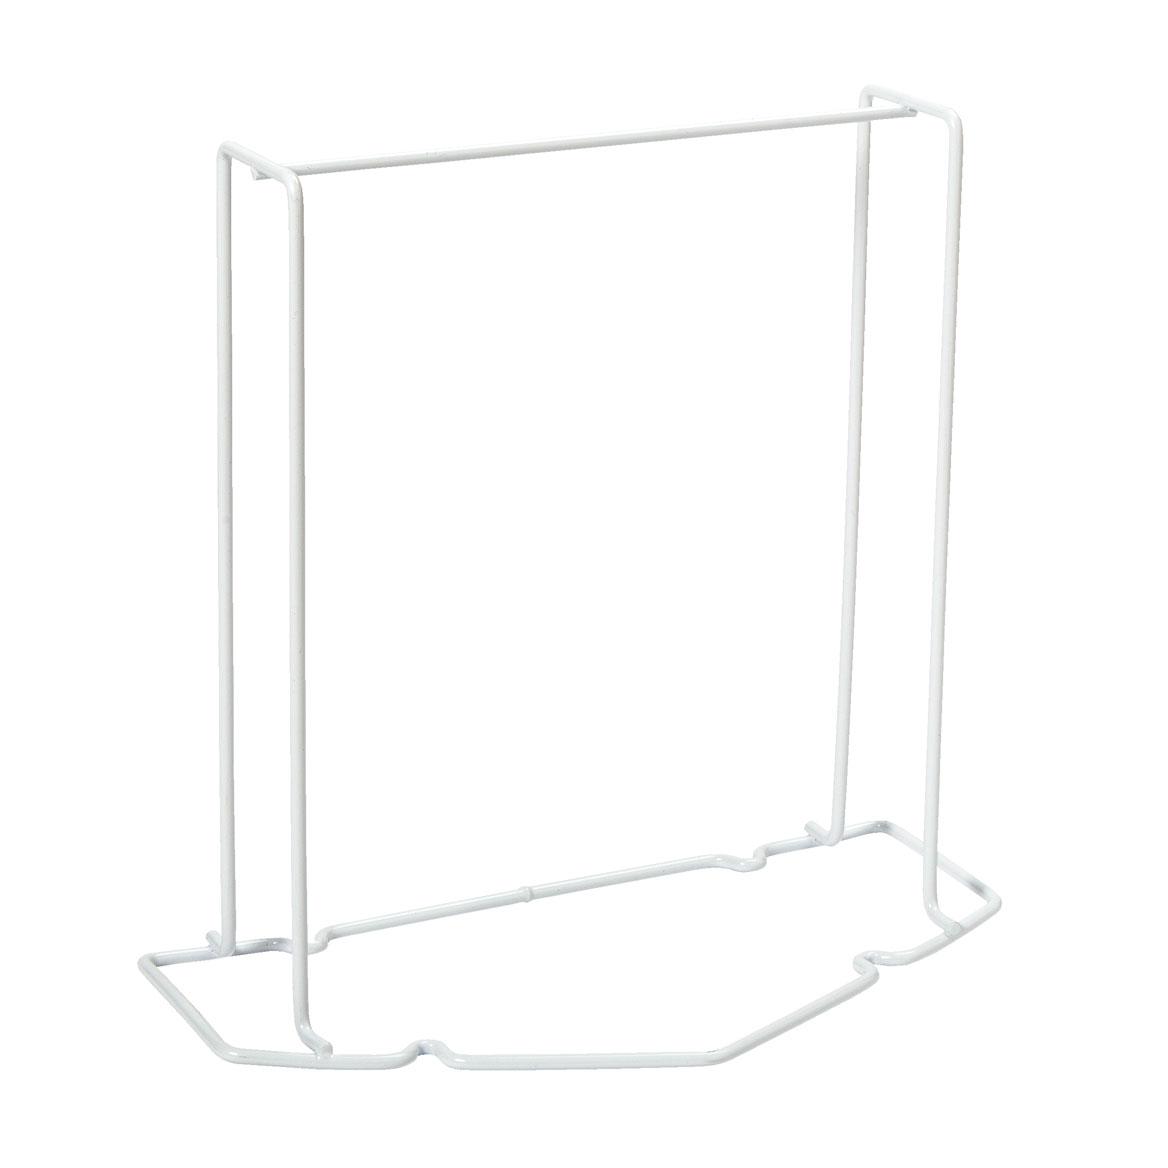 Hanger Storage Rack - Hanger Stacker - Walter Drake